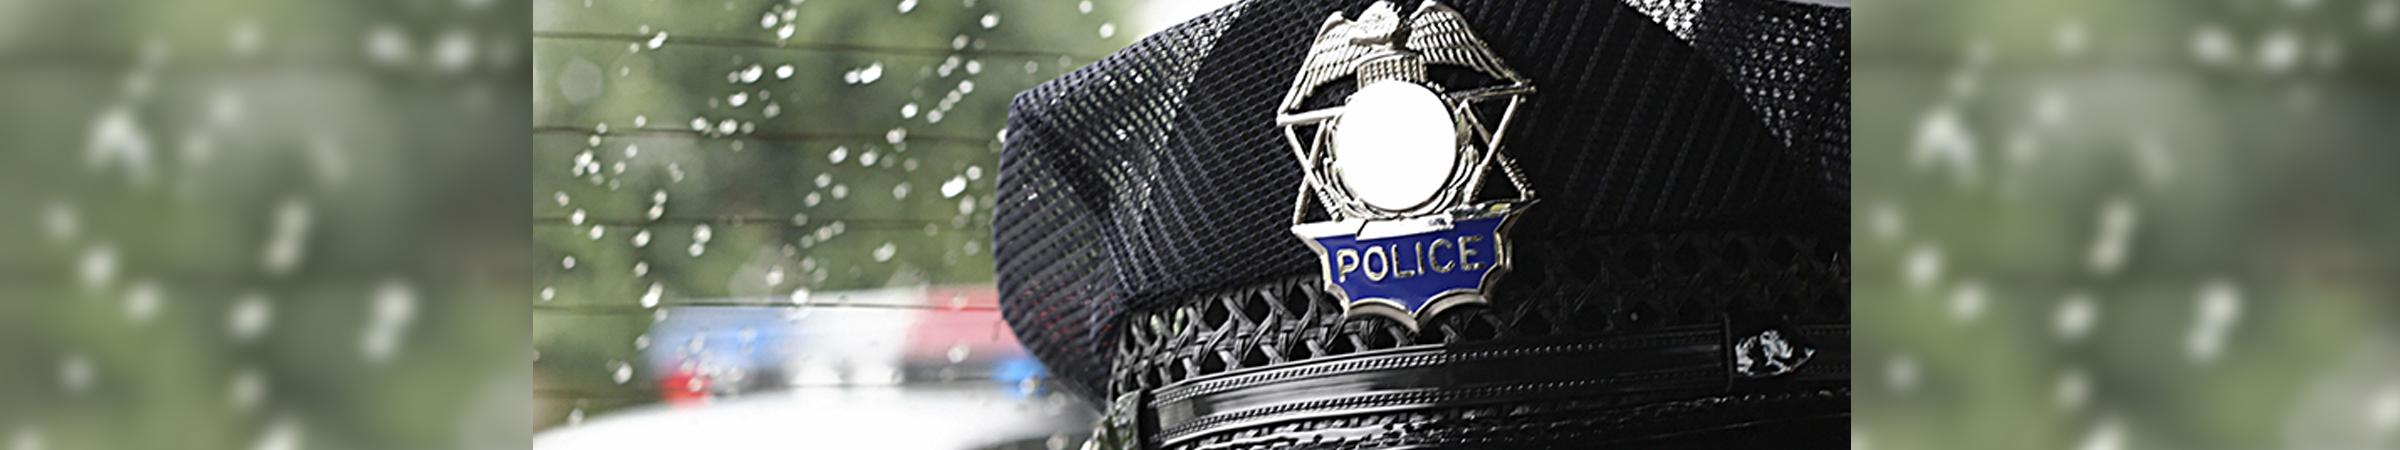 In-Service Training Courses 2019 | Police Academy | Rowan